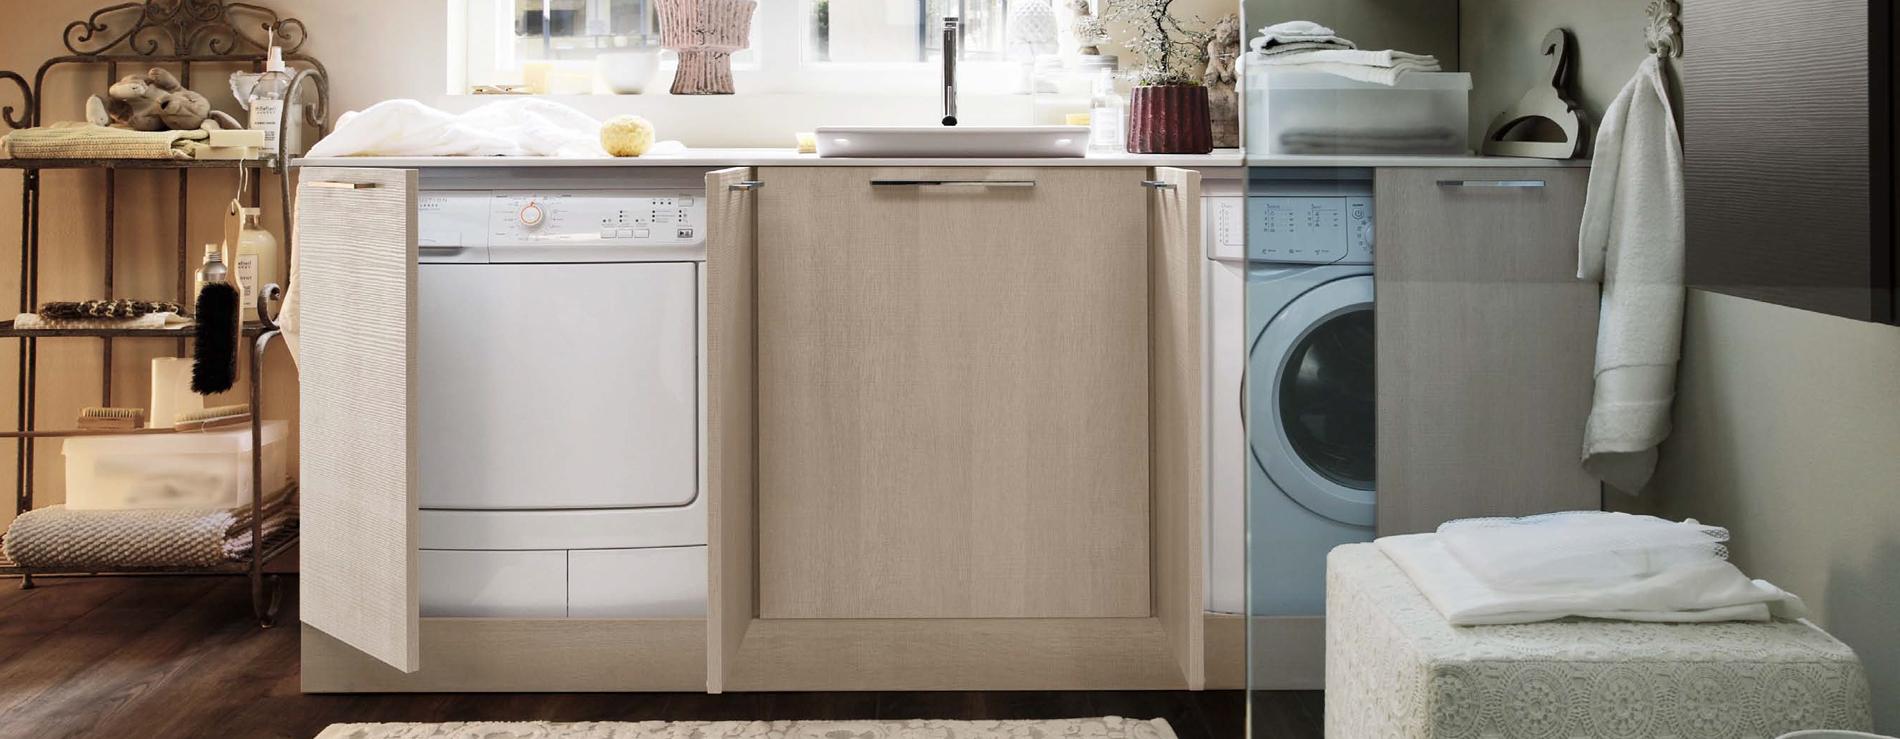 Mobili bianchi per lavanderia design casa creativa e - Mobili per lavanderia di casa ...